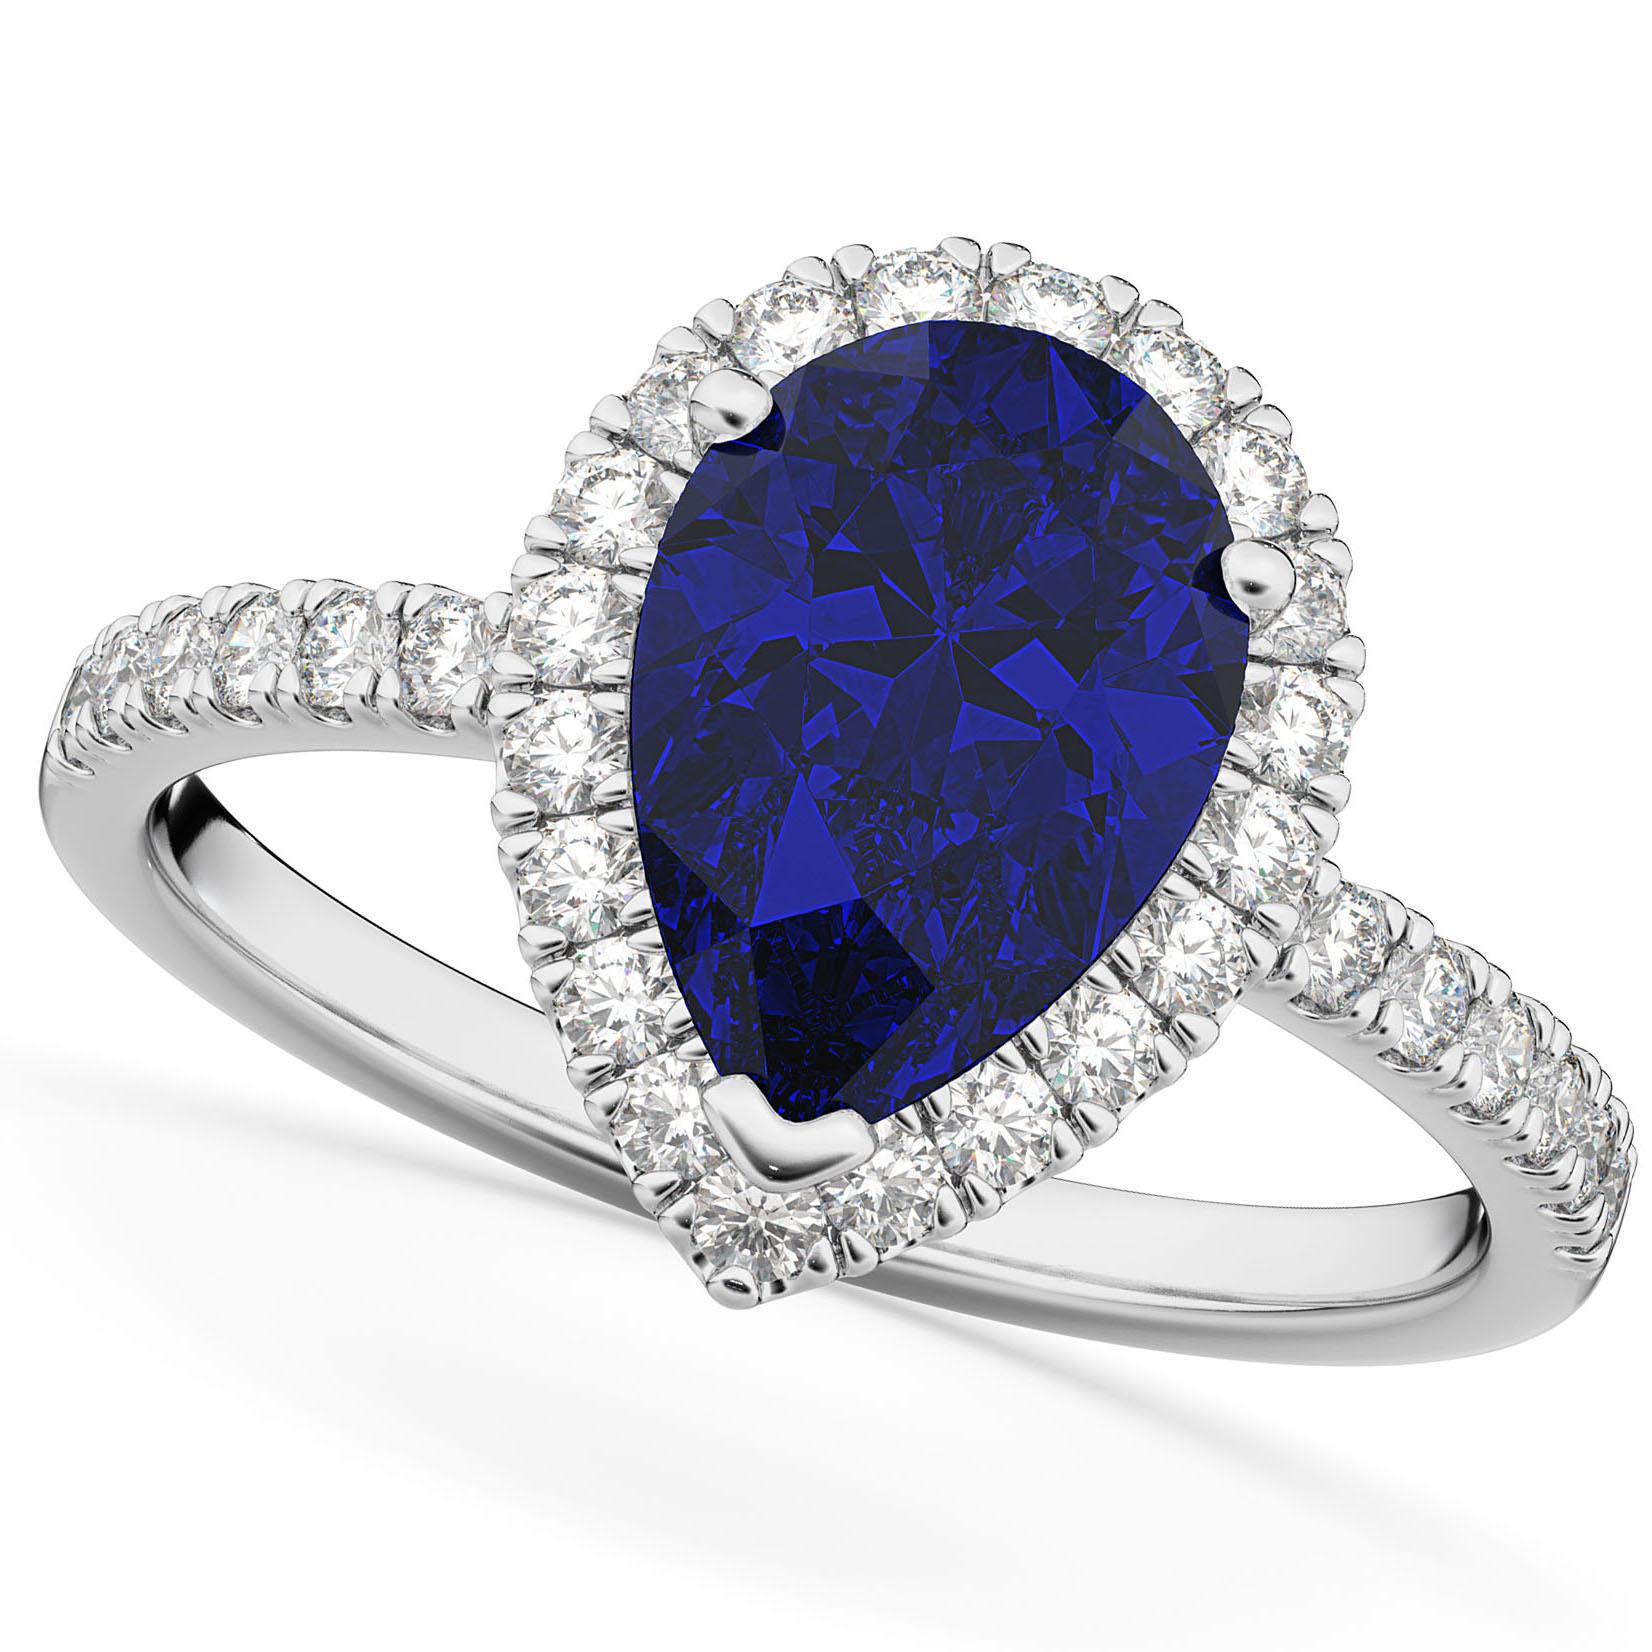 Pear Cut Halo Blue Sapphire & Diamond Engagement Ring 14K White Gold 3.01ct